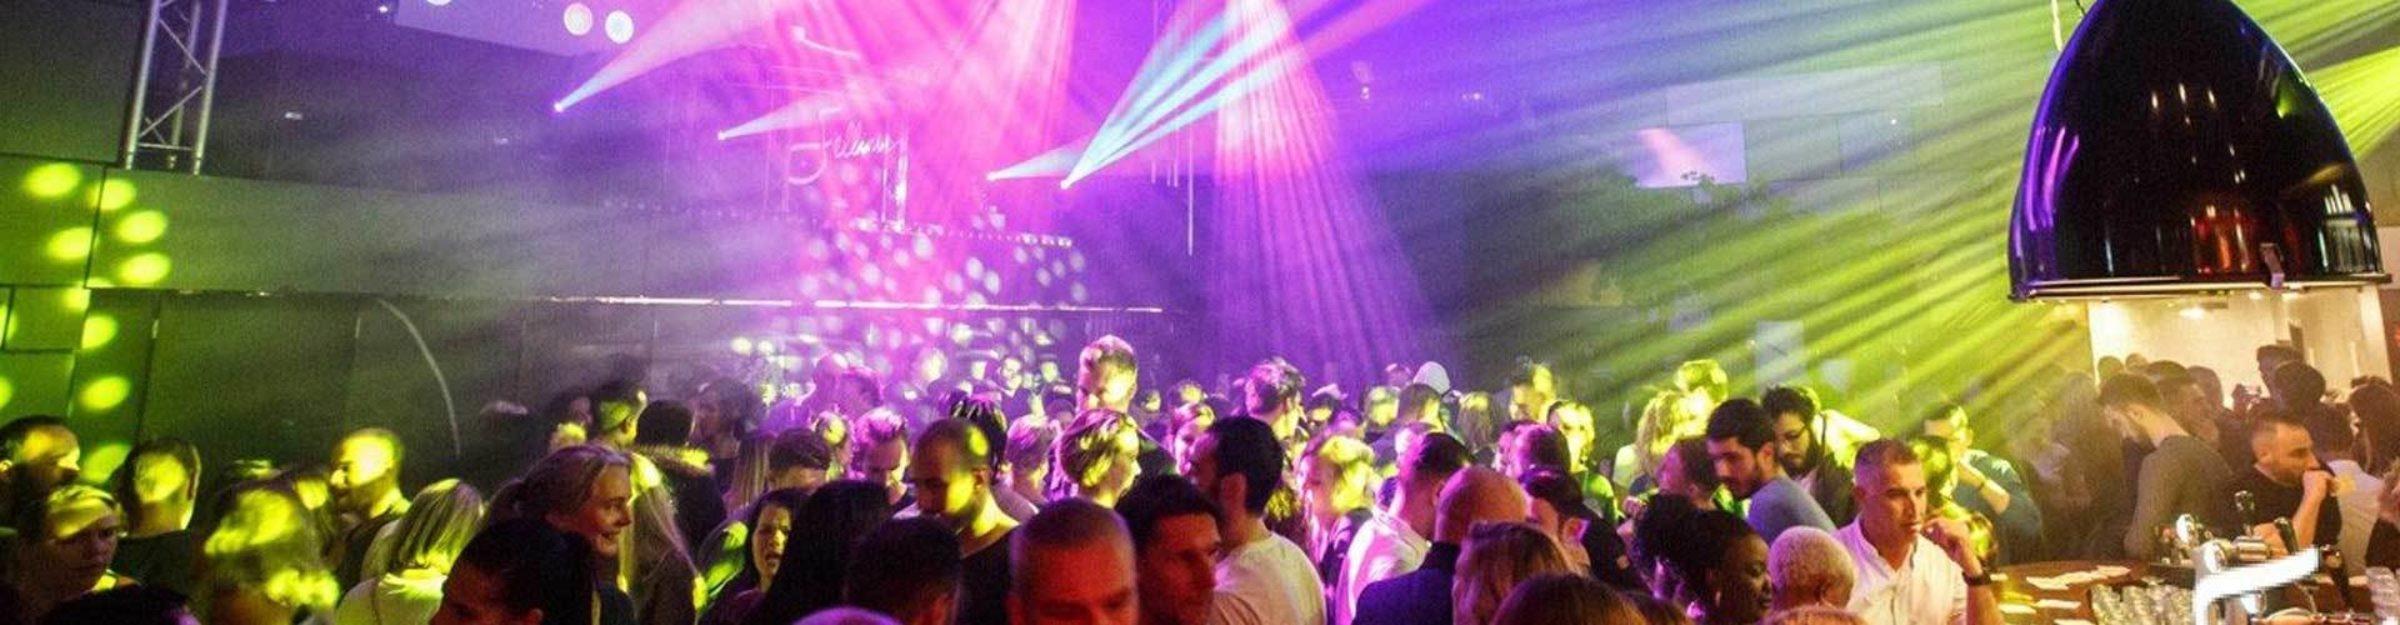 Enschede Fellini Disco Party Slide 05